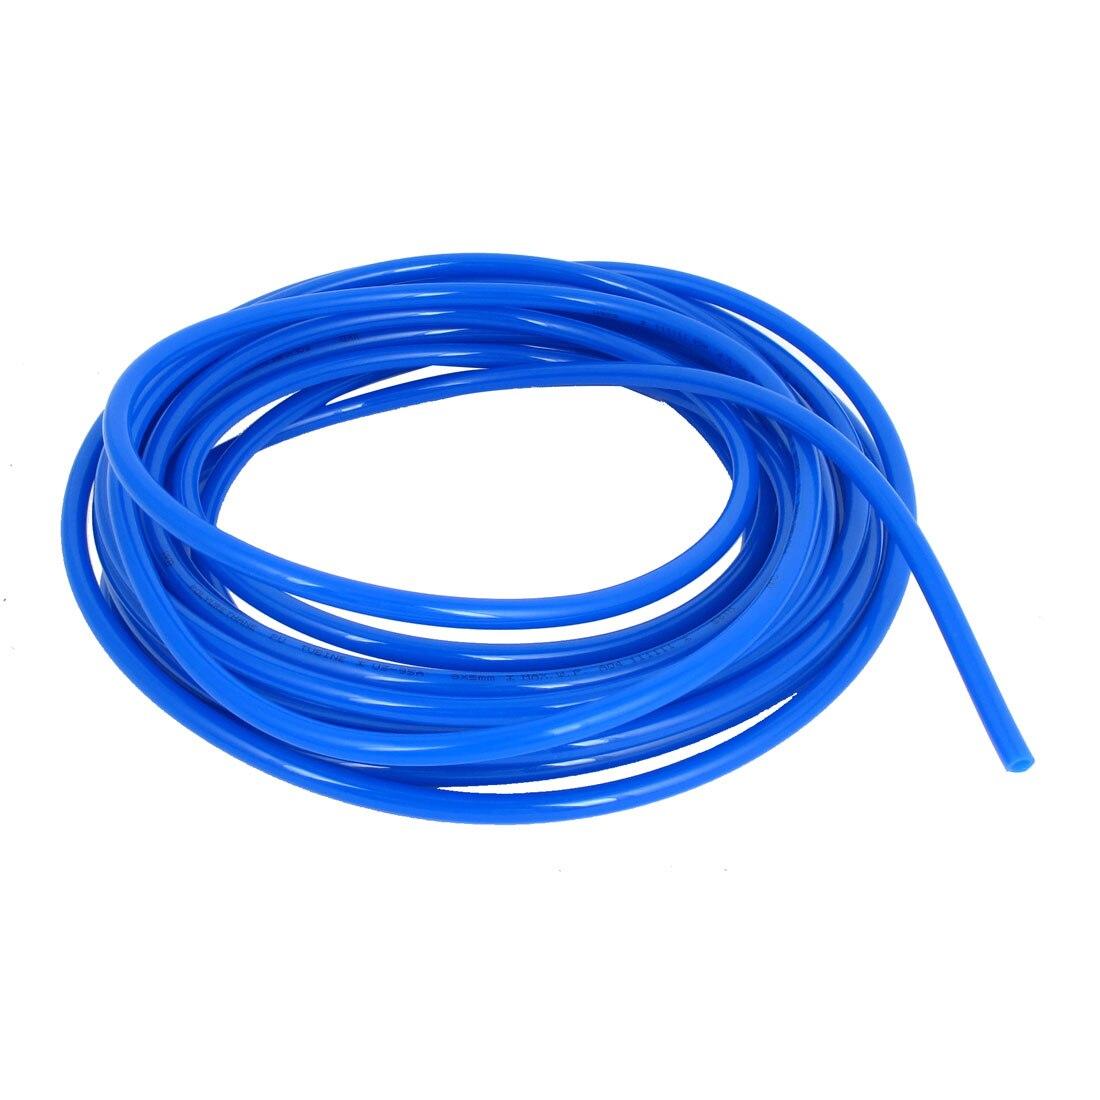 UXCELL 8.6M 28Ft Long 8Mmx5mm Air Fuel Gas Polyurethane Flexible Pu Hose Tube Pipe Blue uxcell 16ft 8mm inner dia clear plastic pvc hose pipe tube for tank air pump aquarium